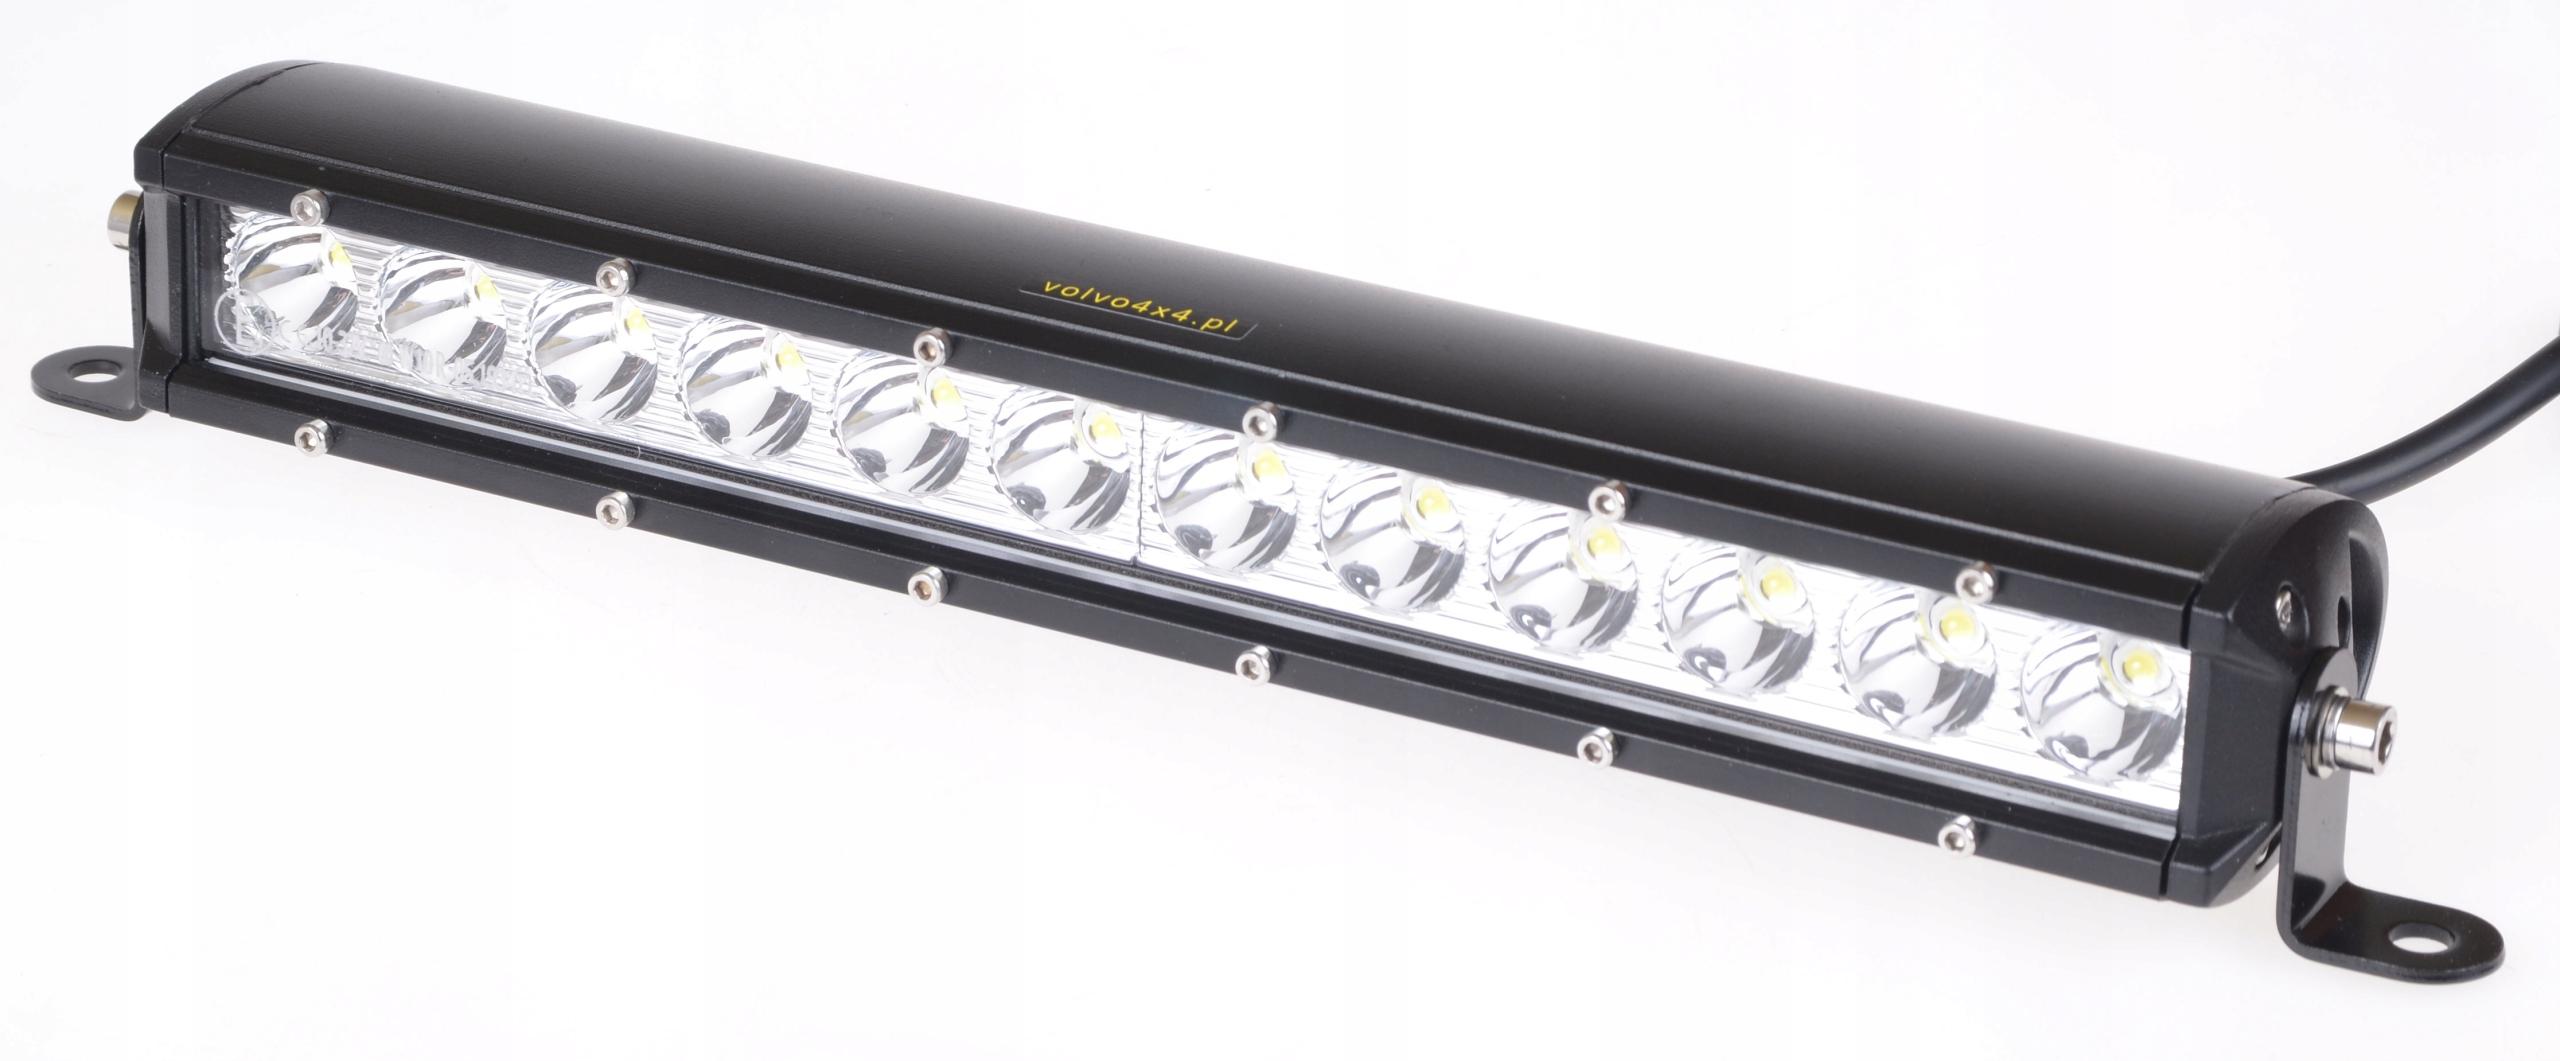 60W LED Панель 12V 24V SUPER SLIM 4x4 РАБОЧАЯ ЛАМПА